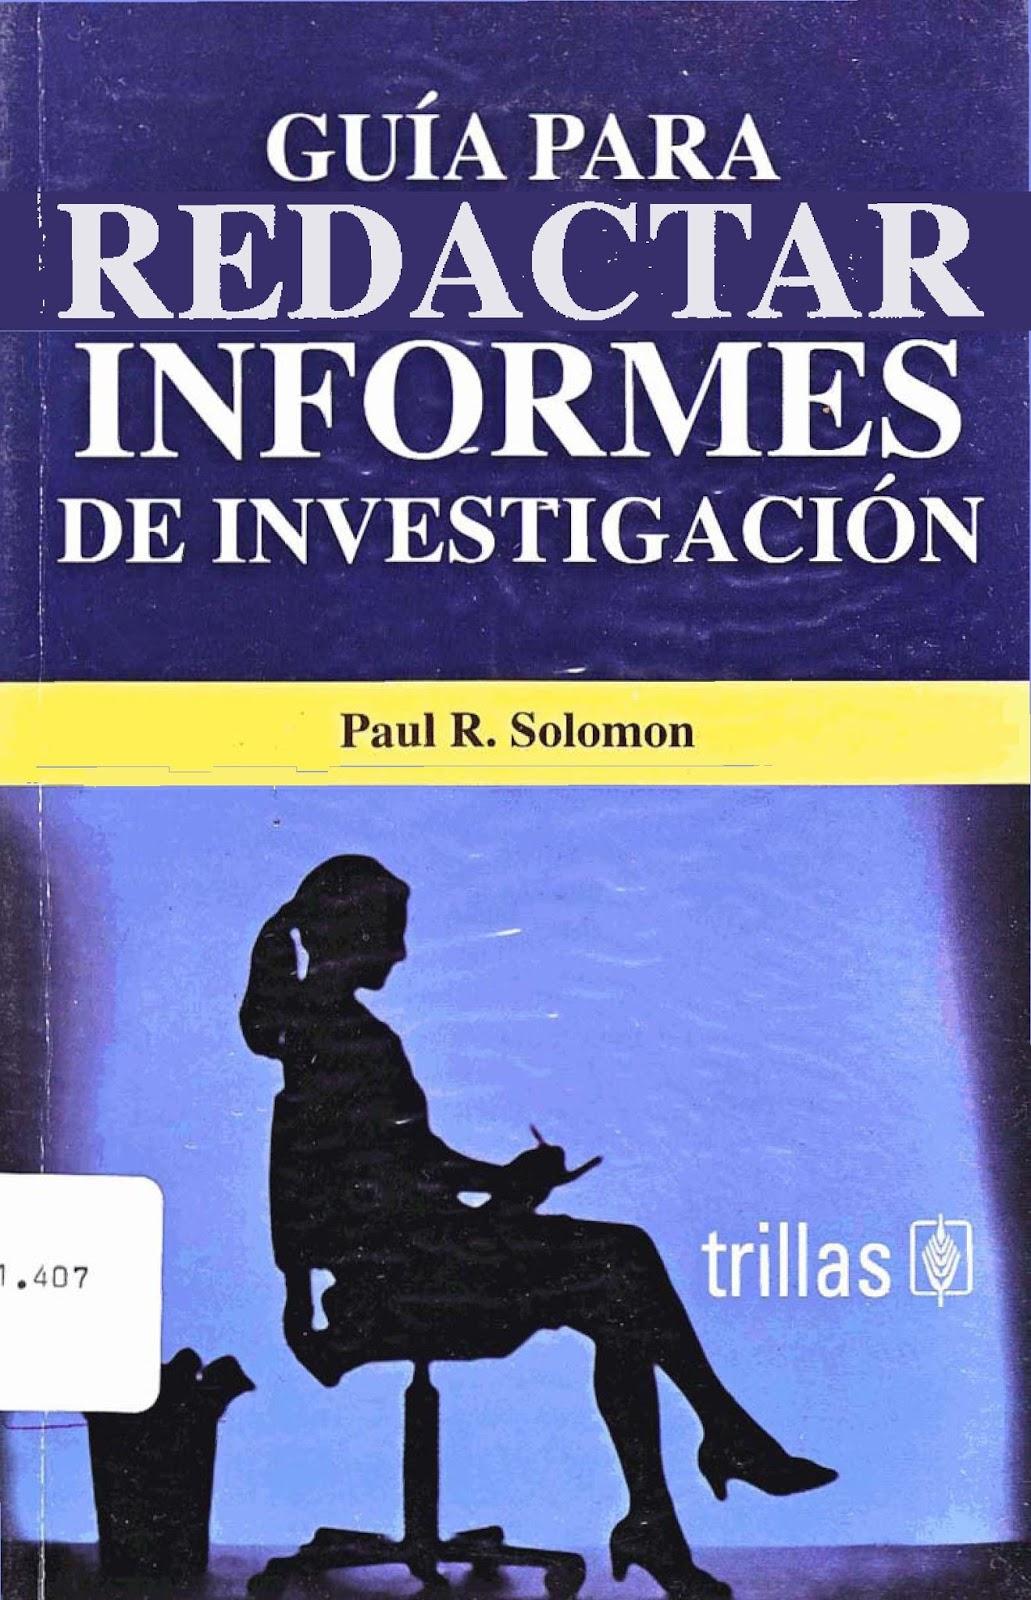 Guía para redactar informes de investigación – Paul R. Solomon